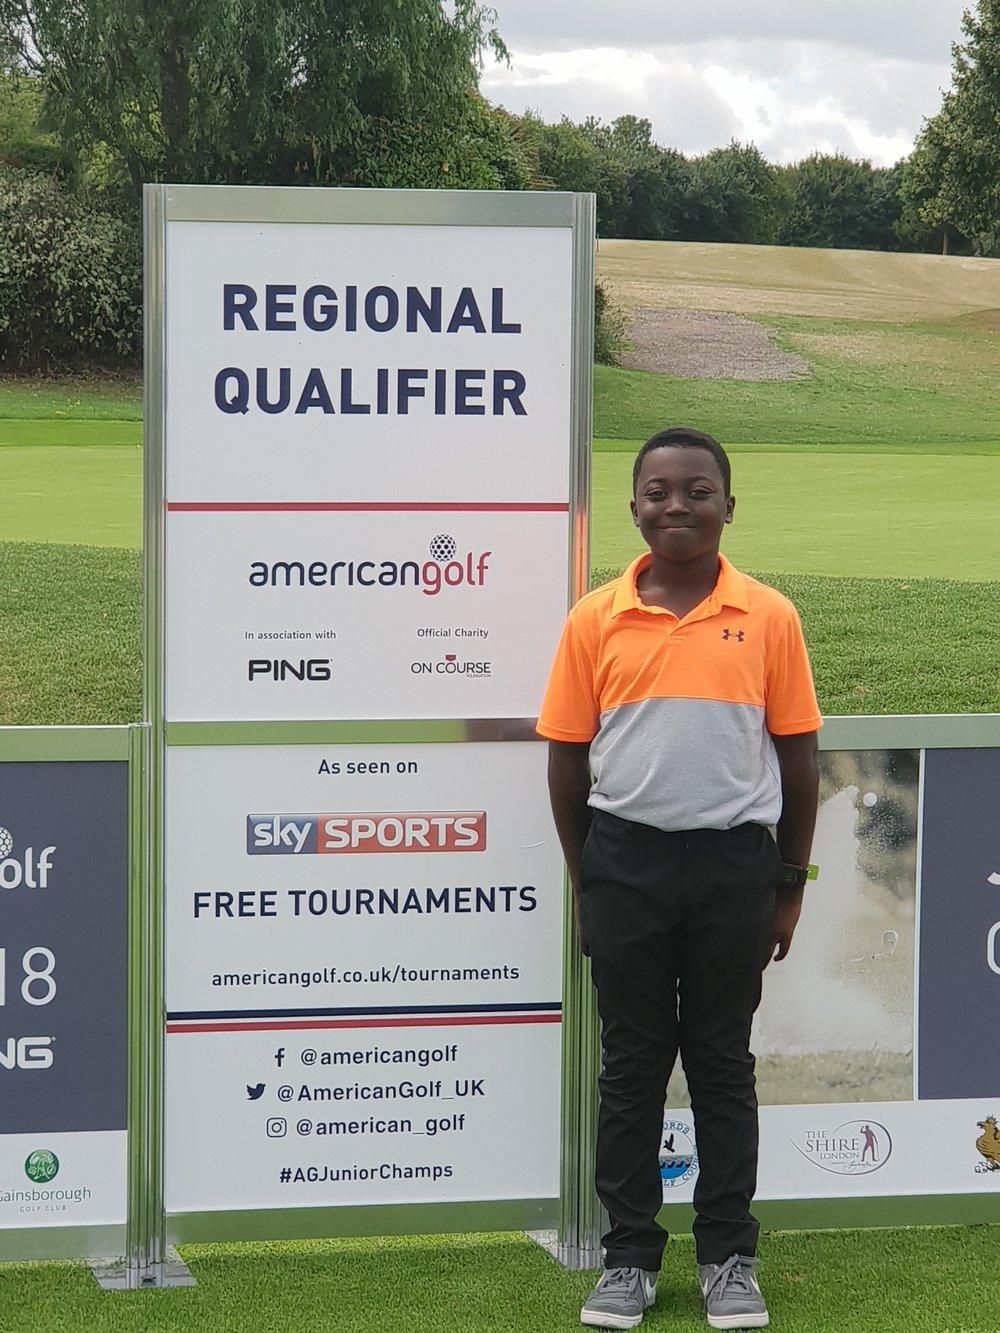 2018 'Winner' Regional Qualifier 'Future Stars' 7-8 age group Junior Regional Championships American Golf - Gaudet Luce GC